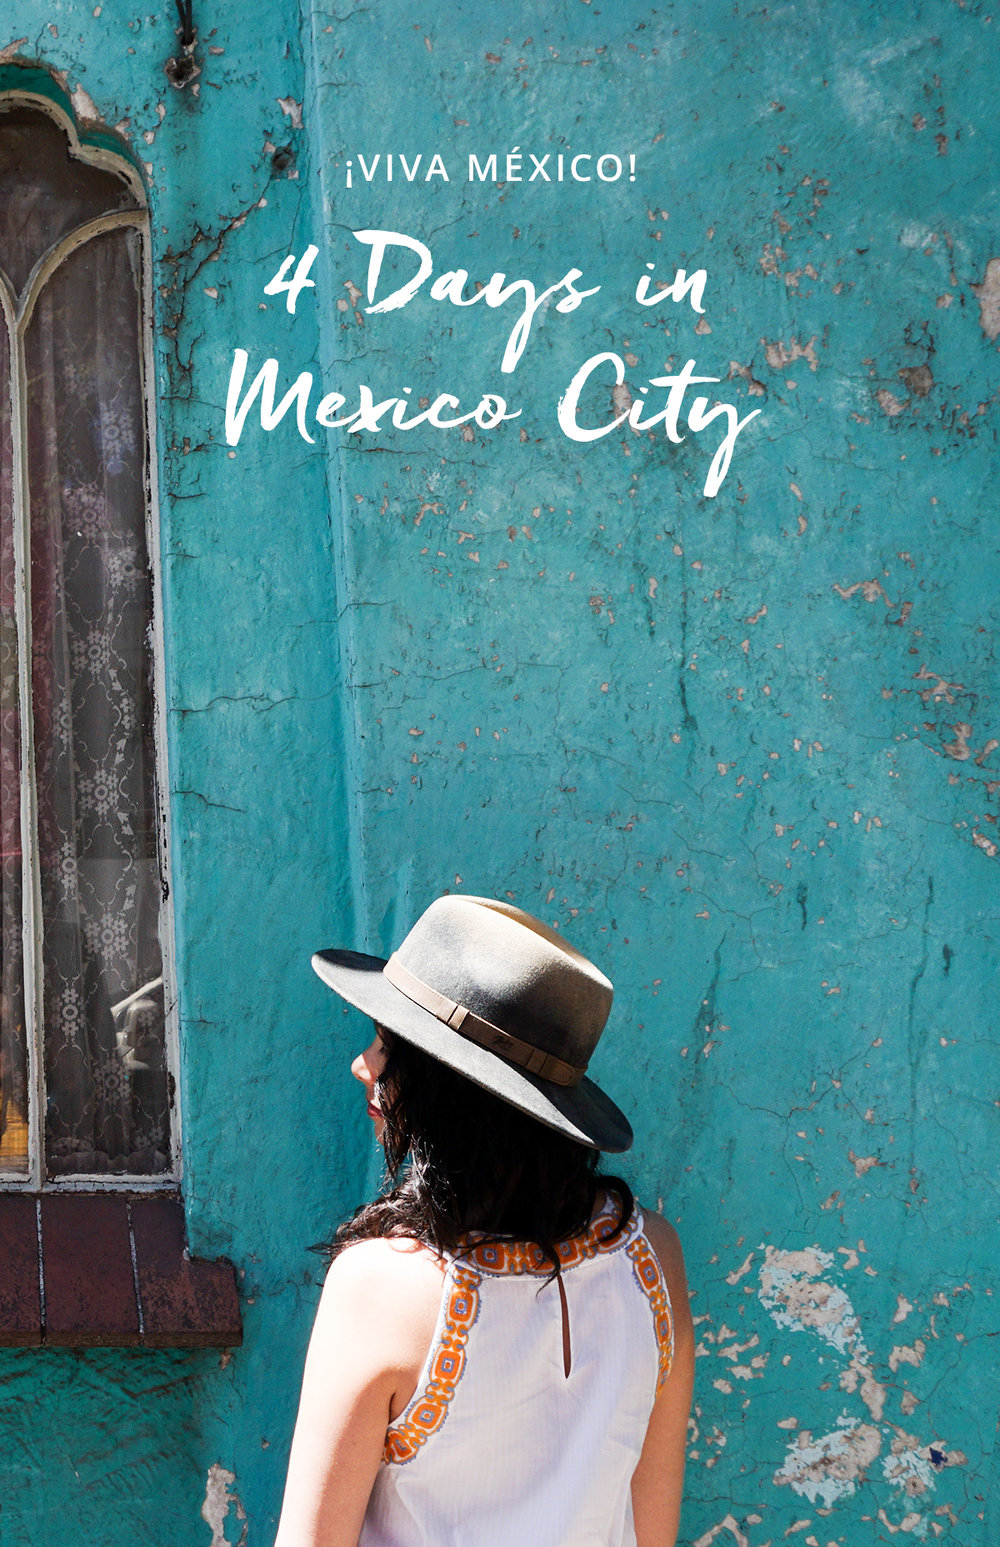 social-chrissihernandez-pin-4-days-in-mexico-city.jpg